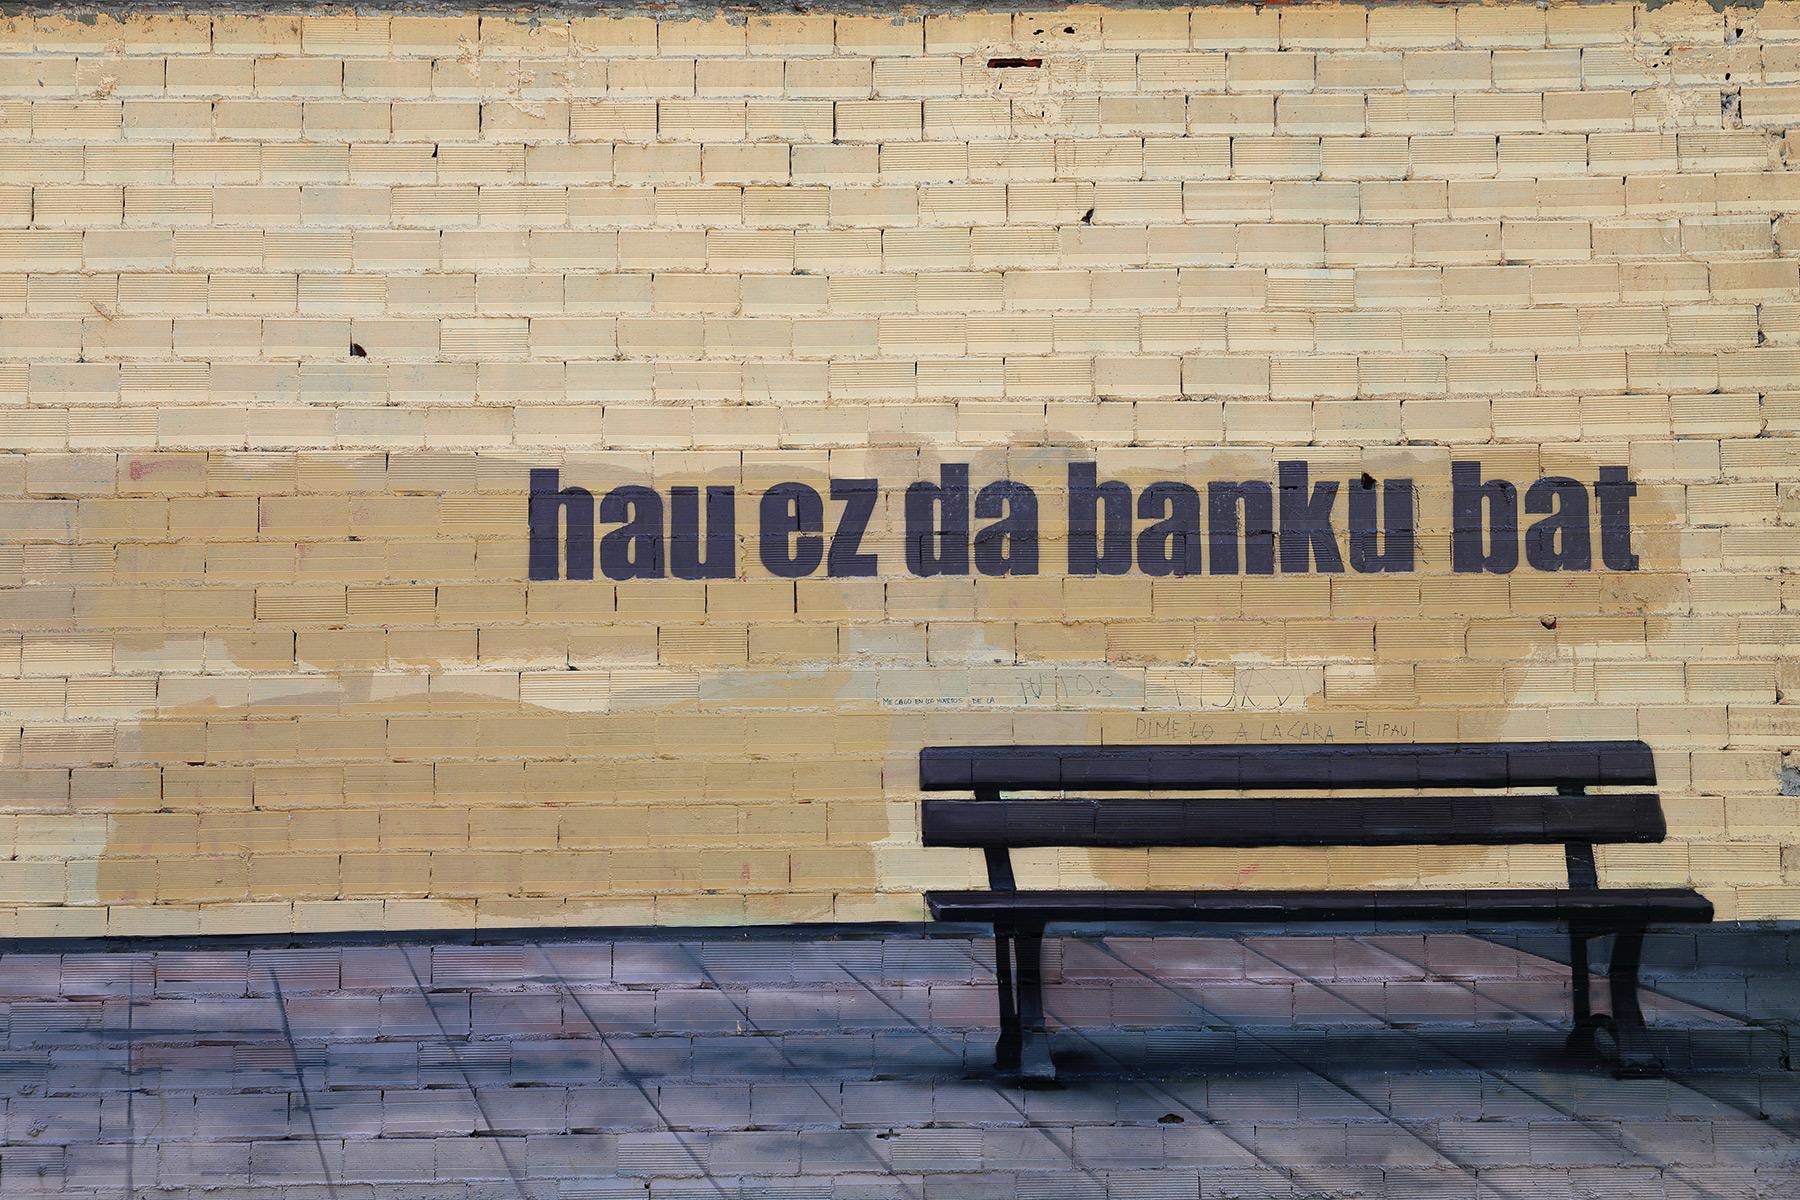 Spanish language: Basque